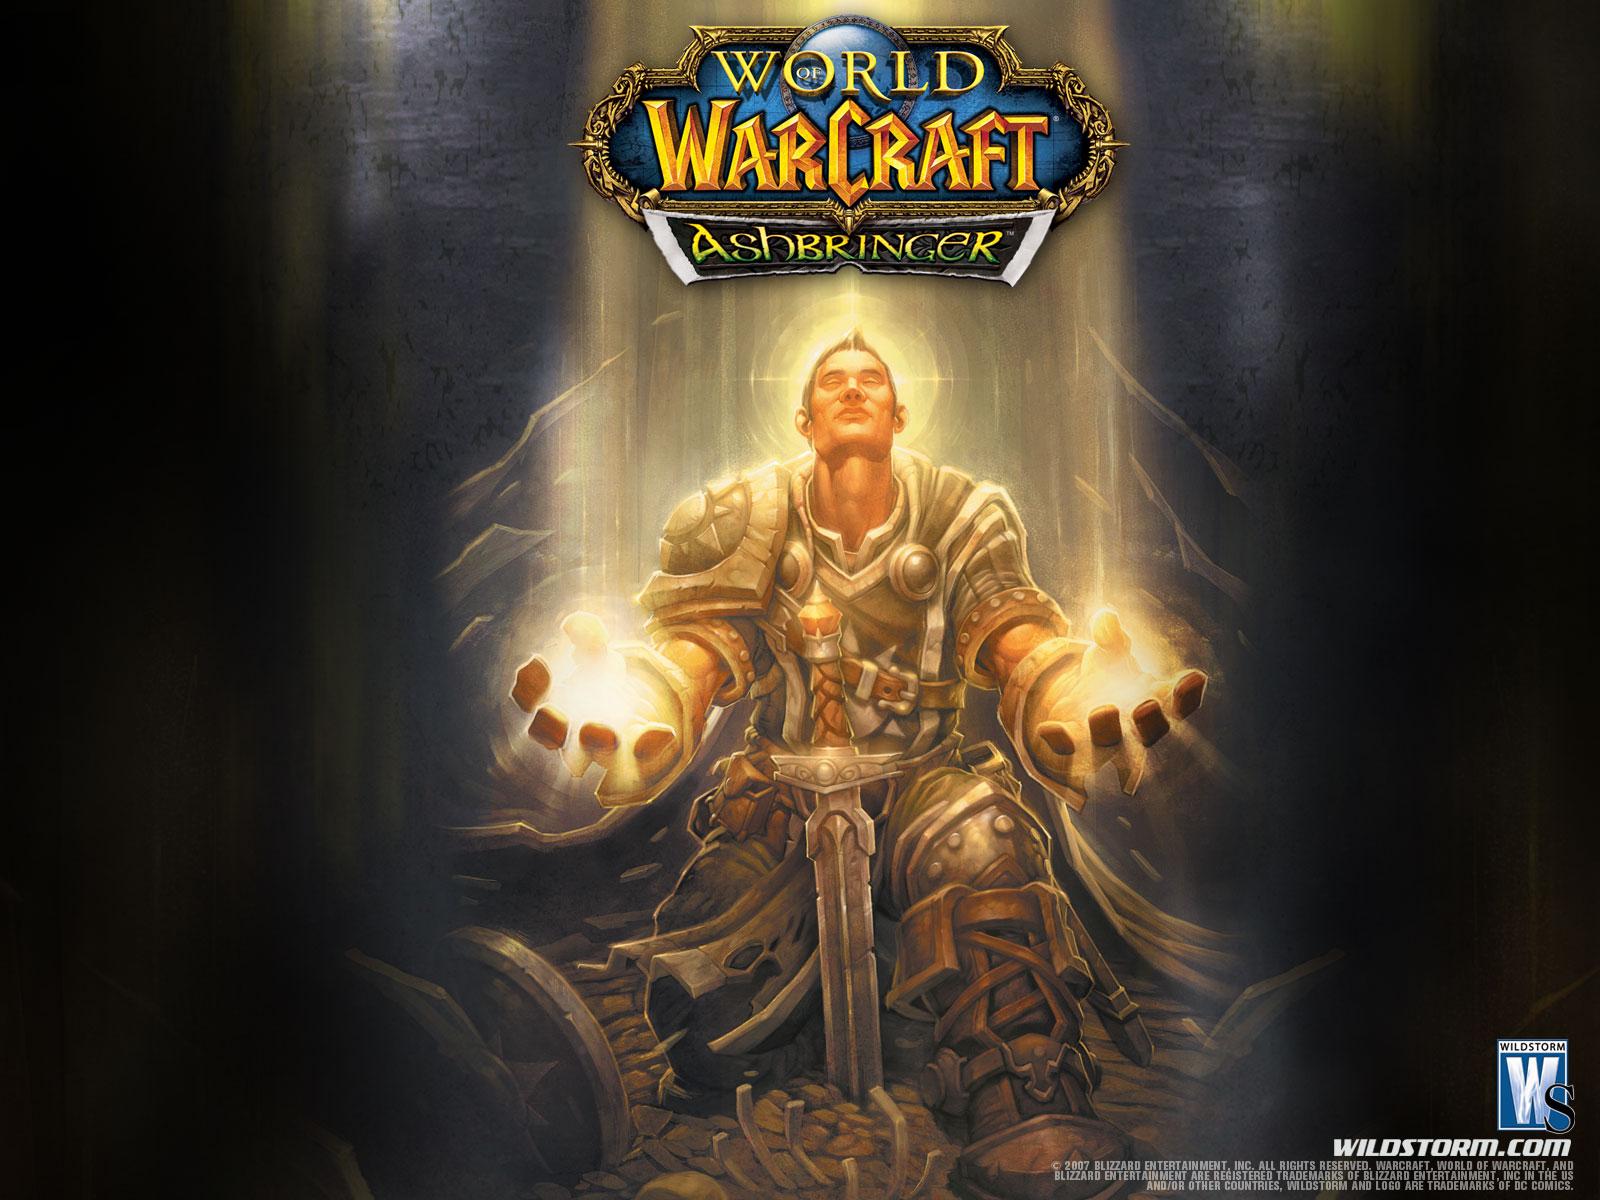 Blizzard Entertainment Wallpaper 7510 ZWALLPIX 1600x1200